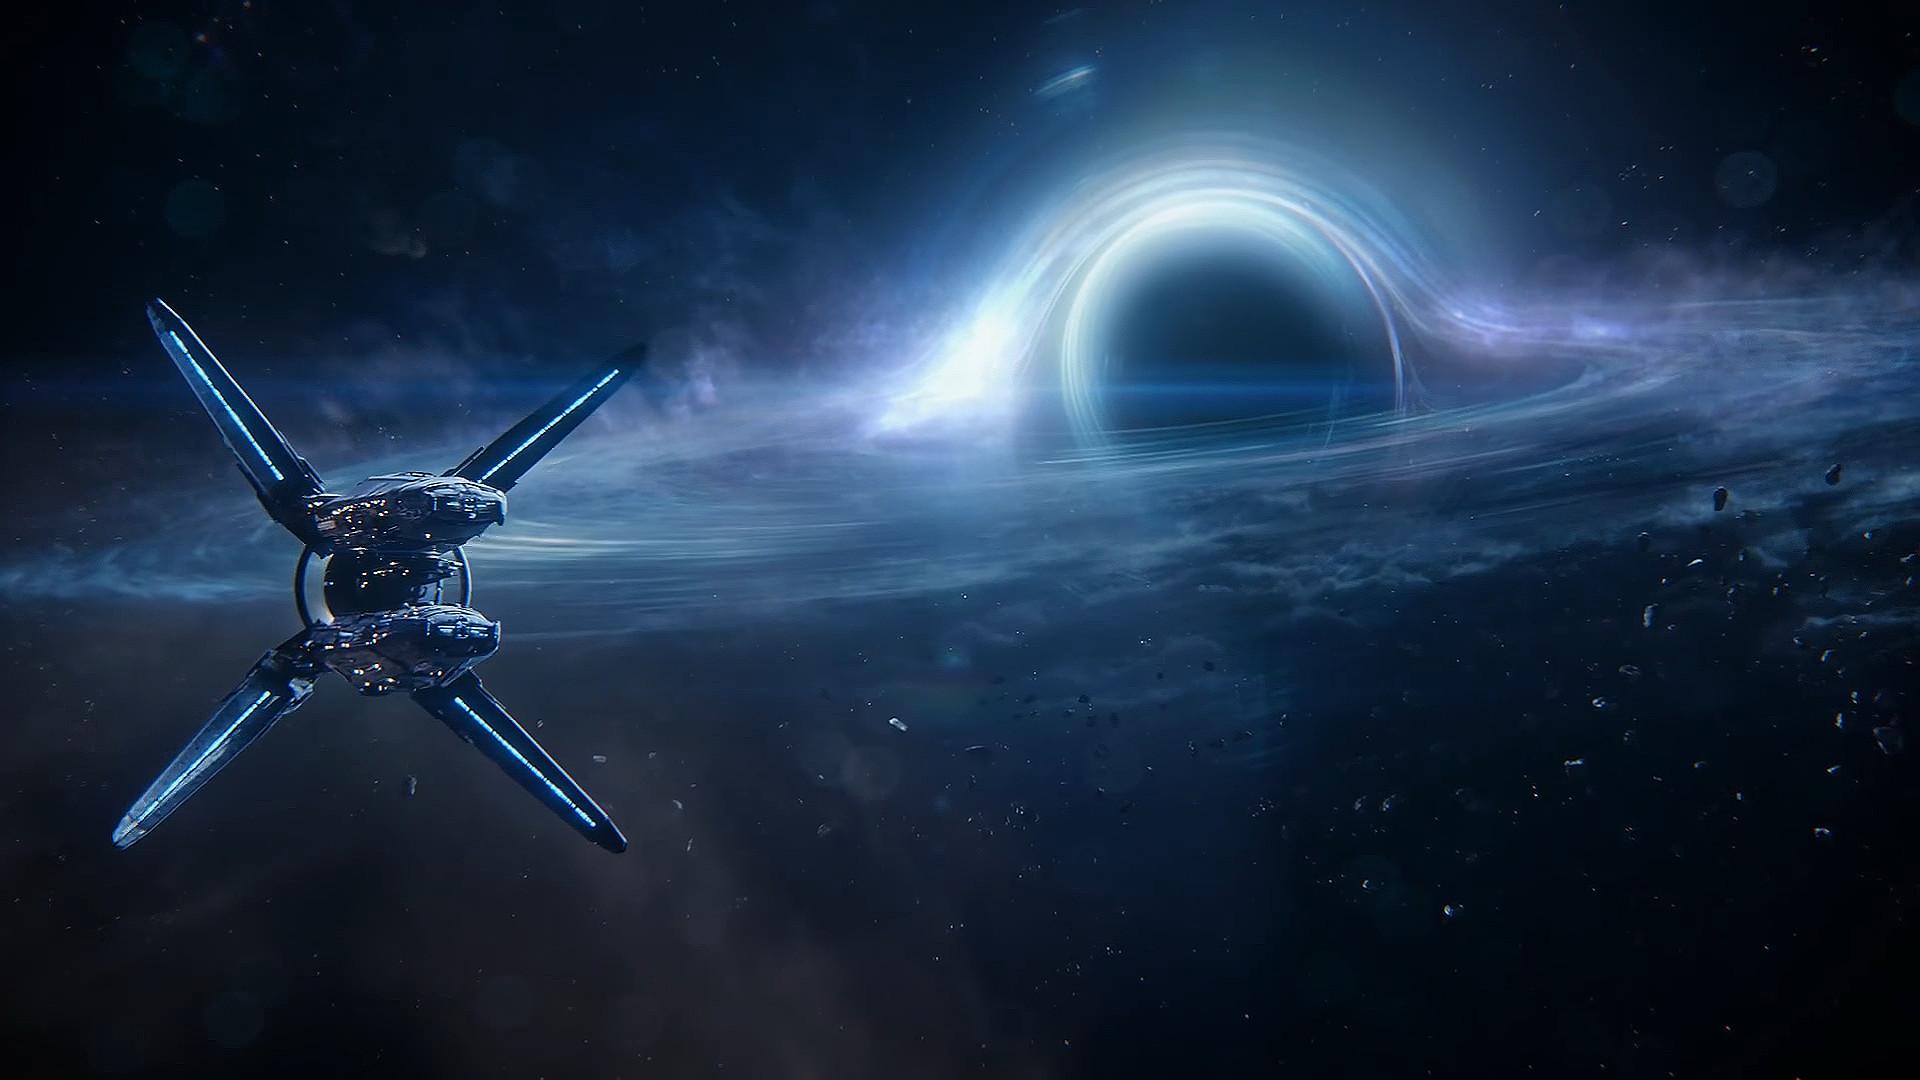 Mass effect andromeda wallpaper hd wallpaper – 4k Mass Effect Andromeda  Wallpaper